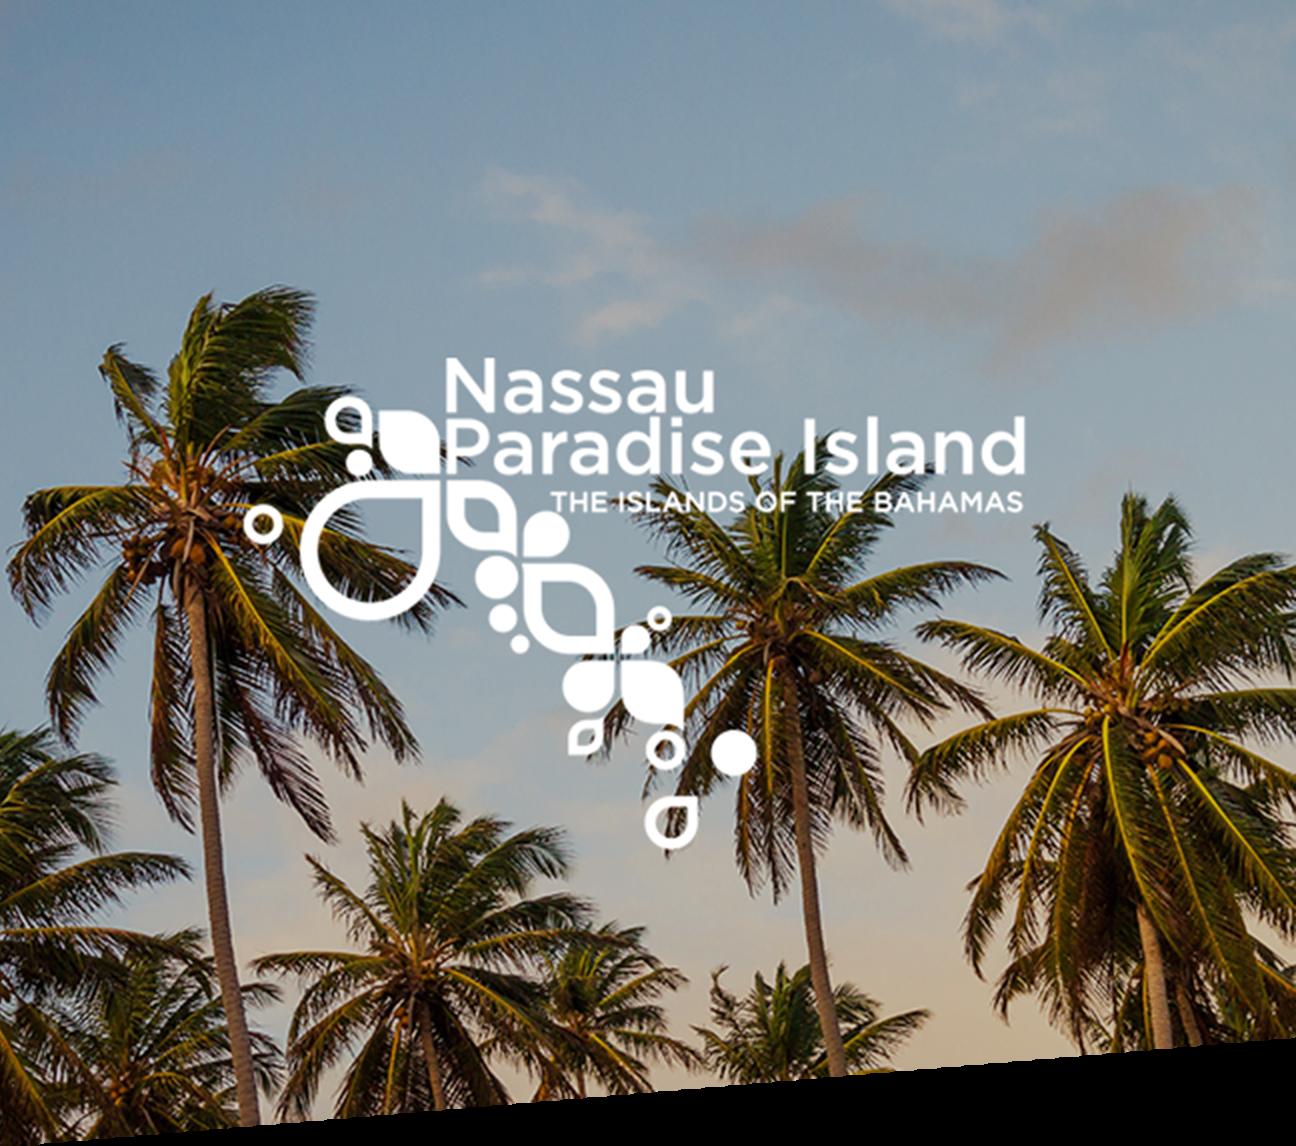 Palm trees with Nassau Paradise Island logo